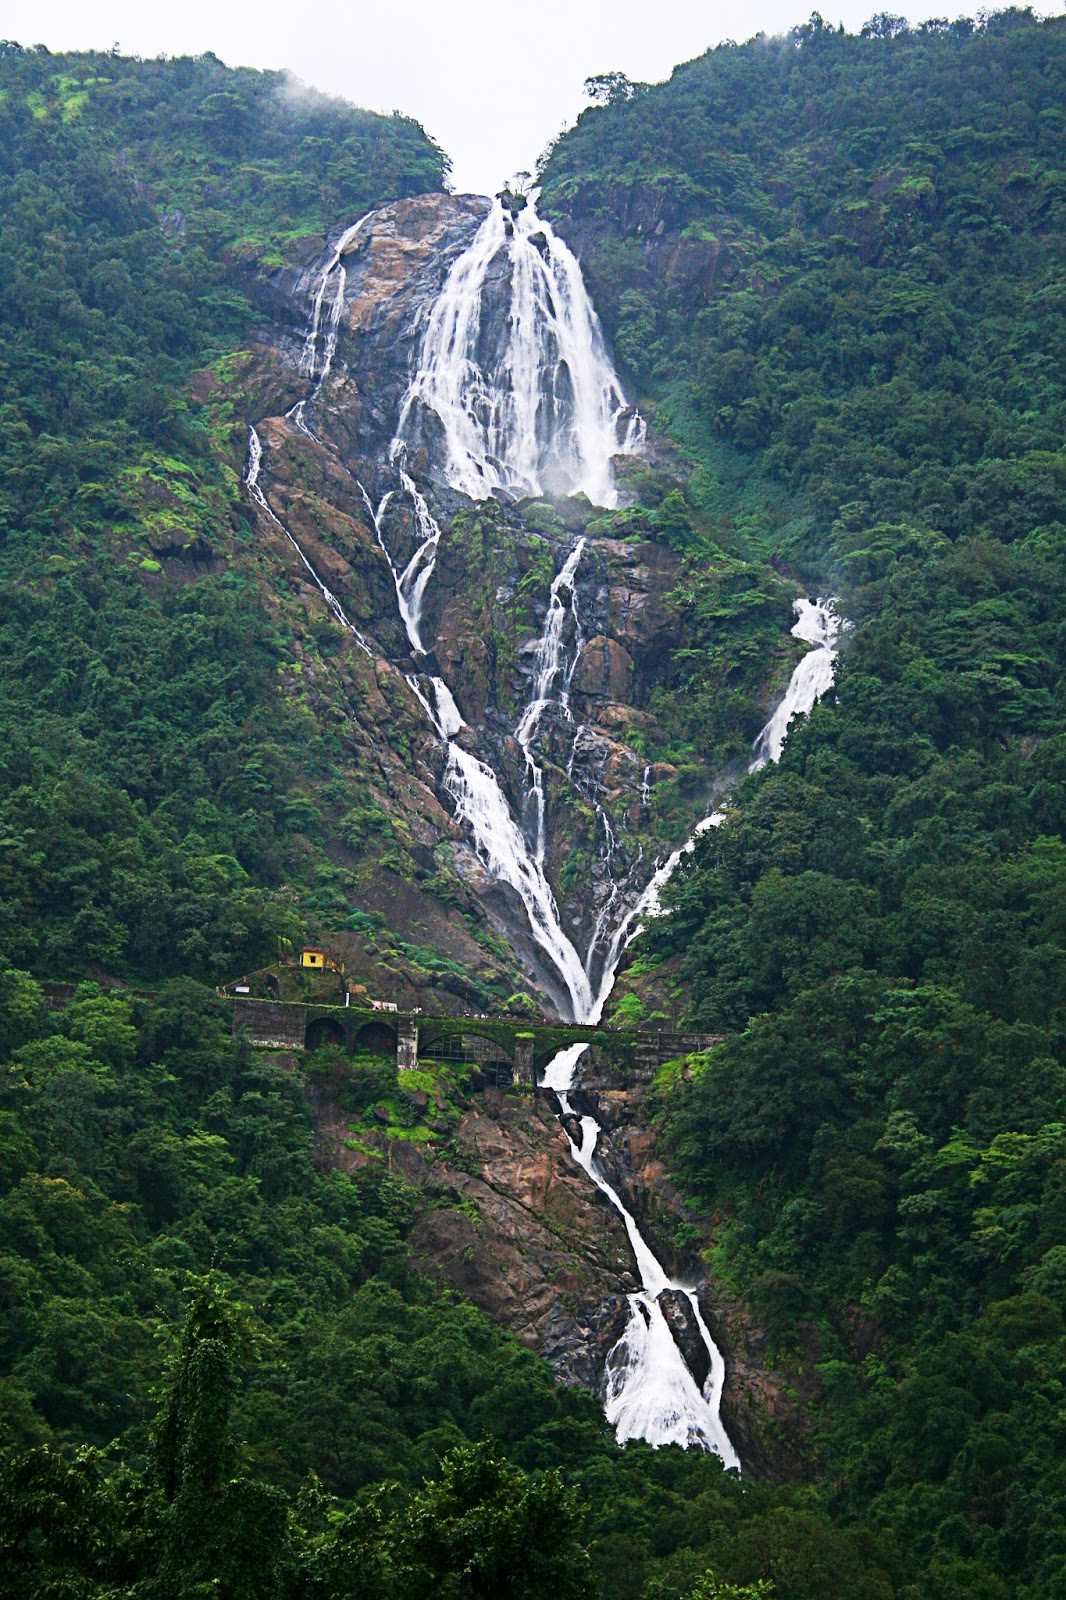 Download image Dudhsagar Falls Goa India PC, Android, iPhone and iPad